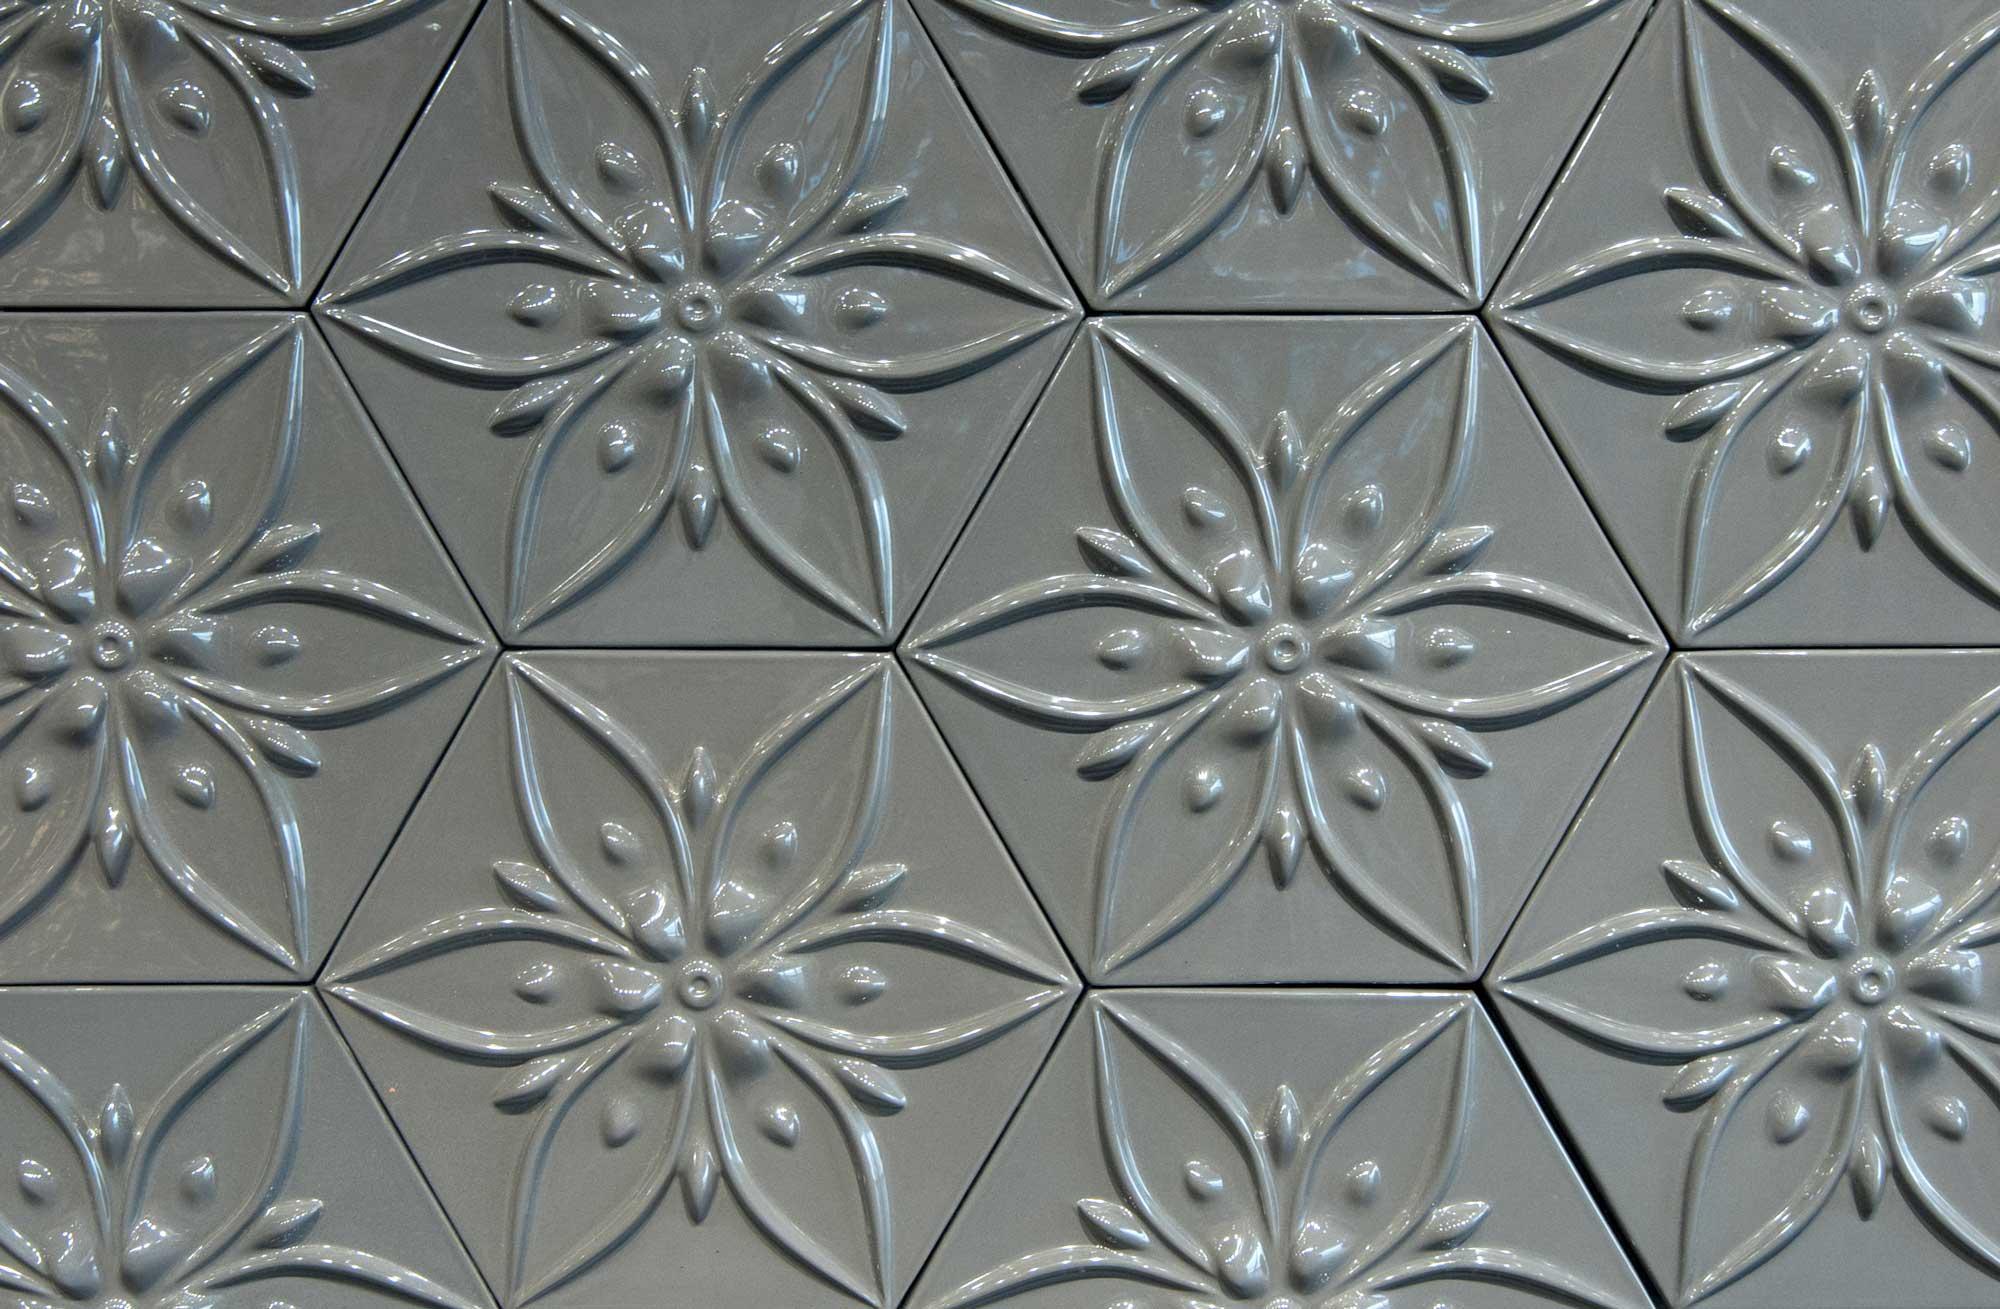 keramik-wandpaneele-wandfliesen-grau-mokka-flowers